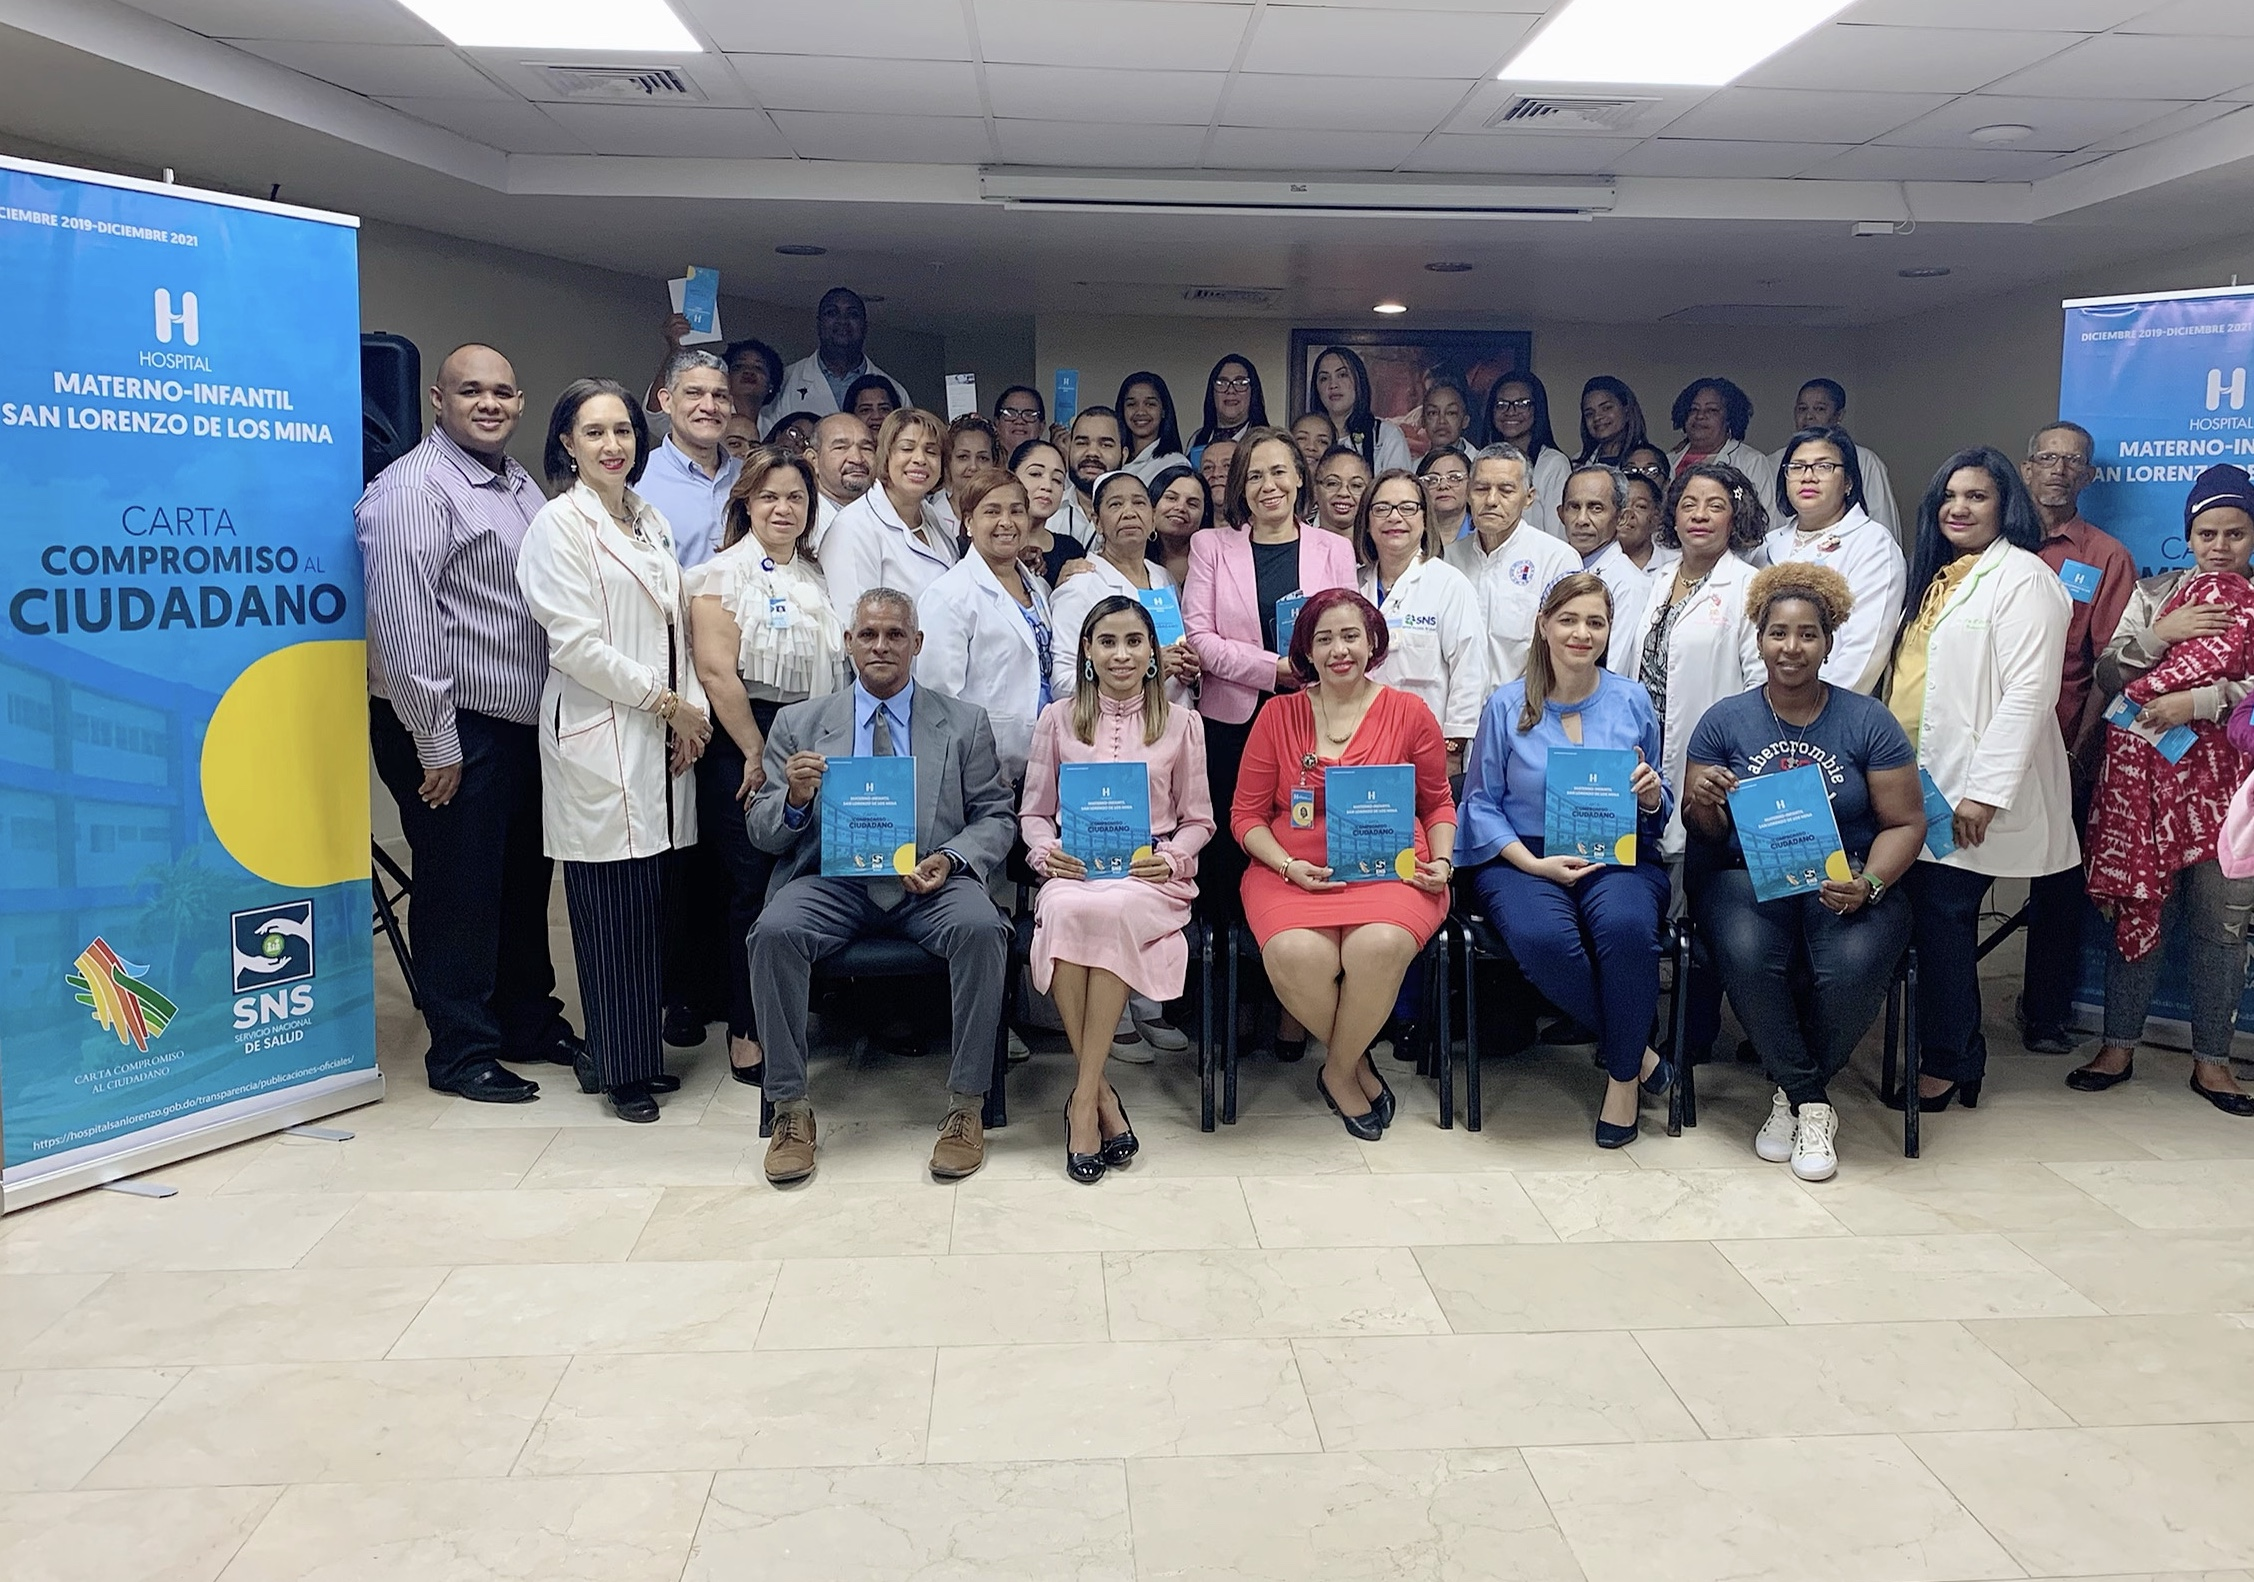 Read more about the article Hospital Materno Infantil San Lorenzo de Los Mina presenta Carta Compromiso al Ciudadano